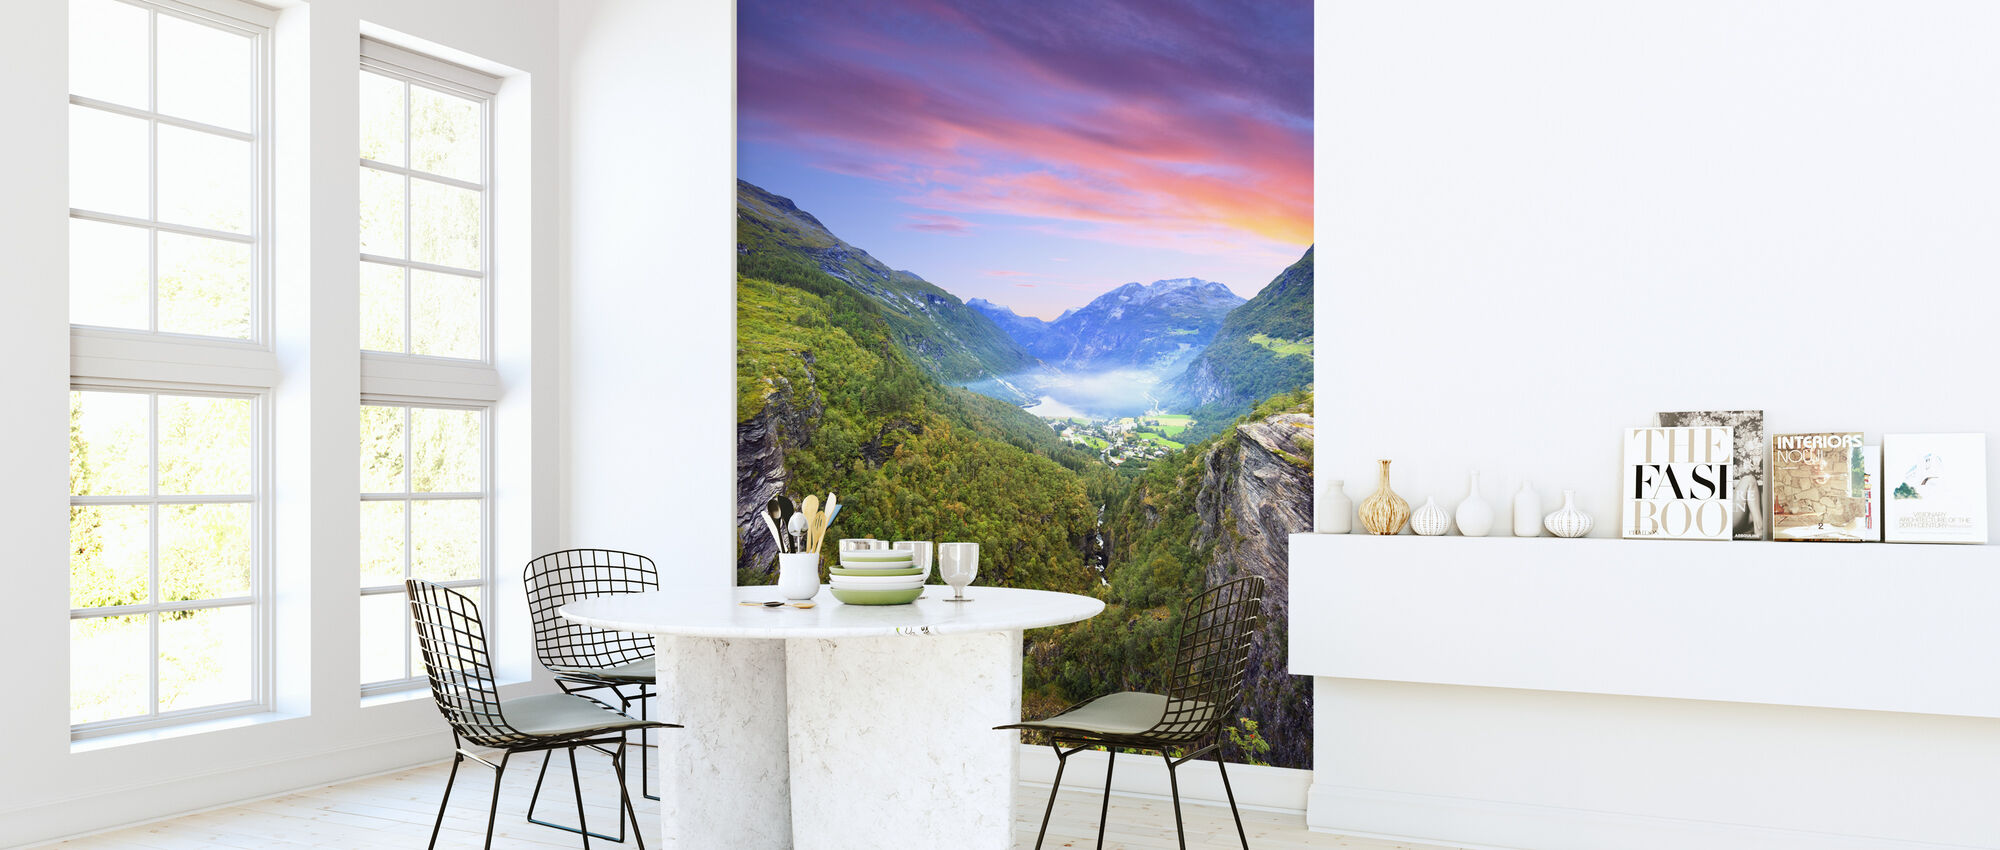 Pink Clouds over Geirangerfjord, Norway - Wallpaper - Kitchen